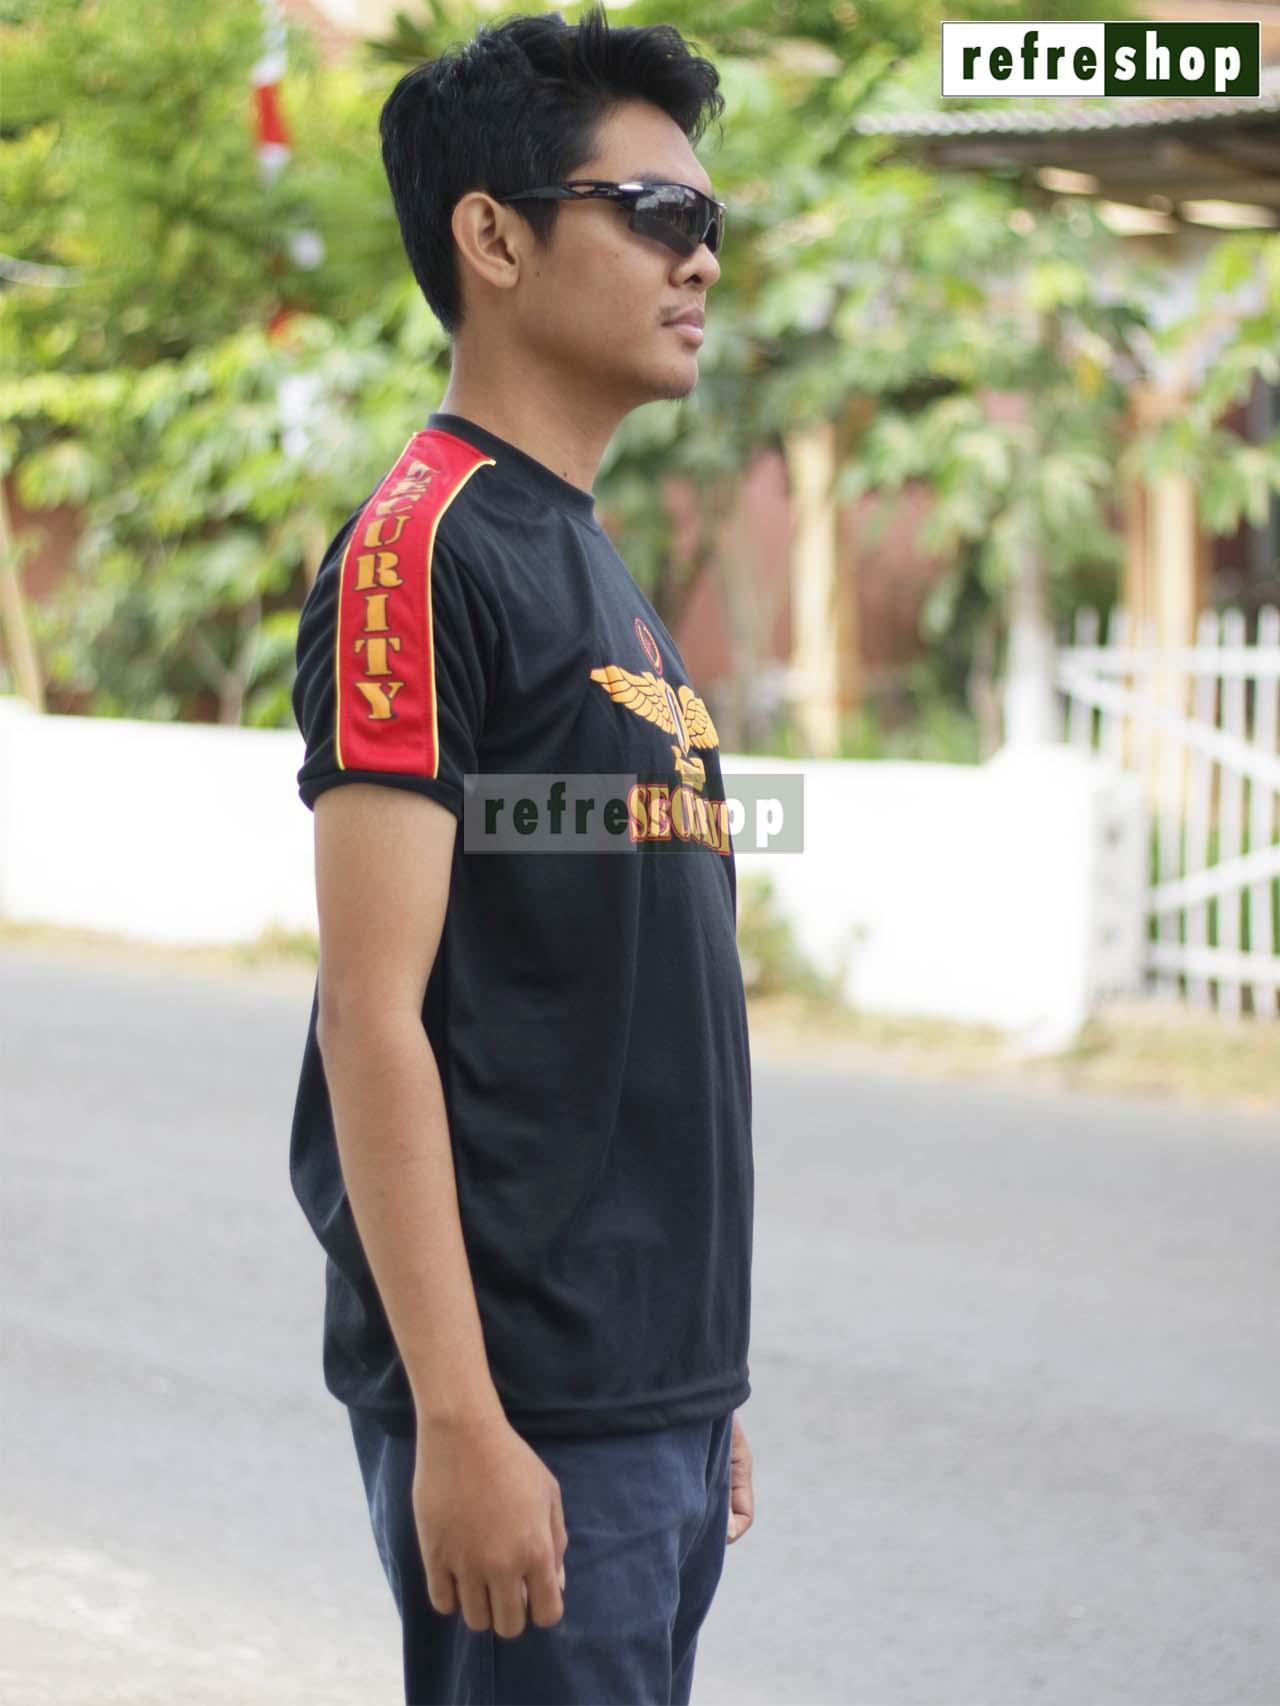 ... Kaos Security Lembut Nyaman KSPDH02DD Lengan Pendek Murah Awet Grosir Berkualitas - 3 ...